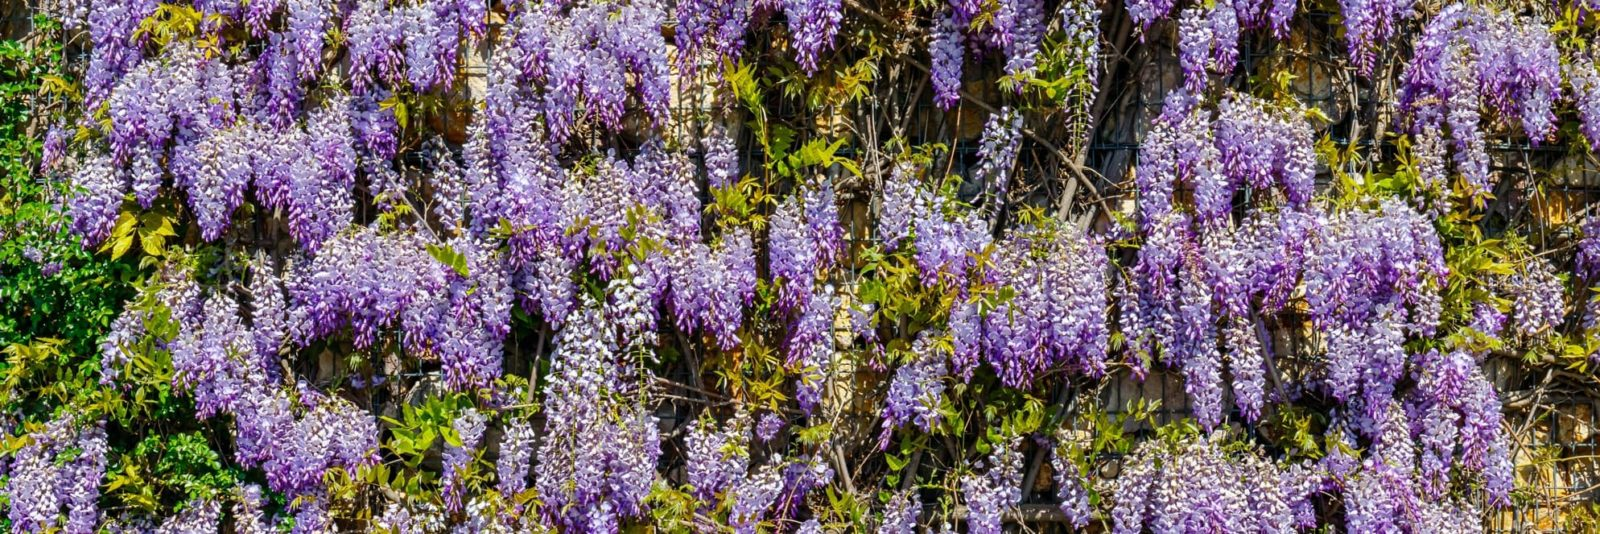 flowering purple Chinese wisteria